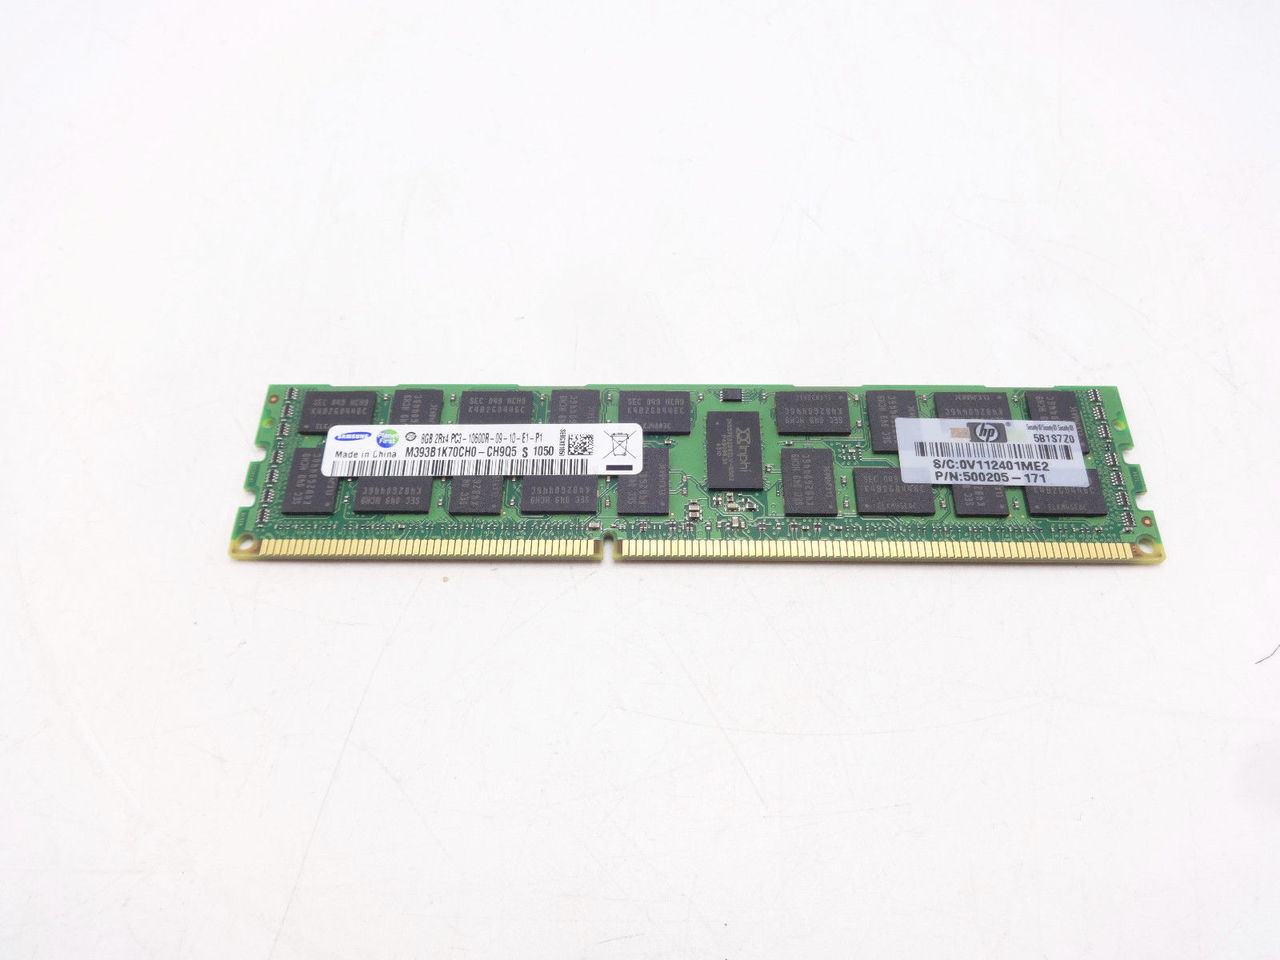 HP 593913-B21 HP 8GB (1X8GB) 2RX4 PC3-10600R-9 memory kit